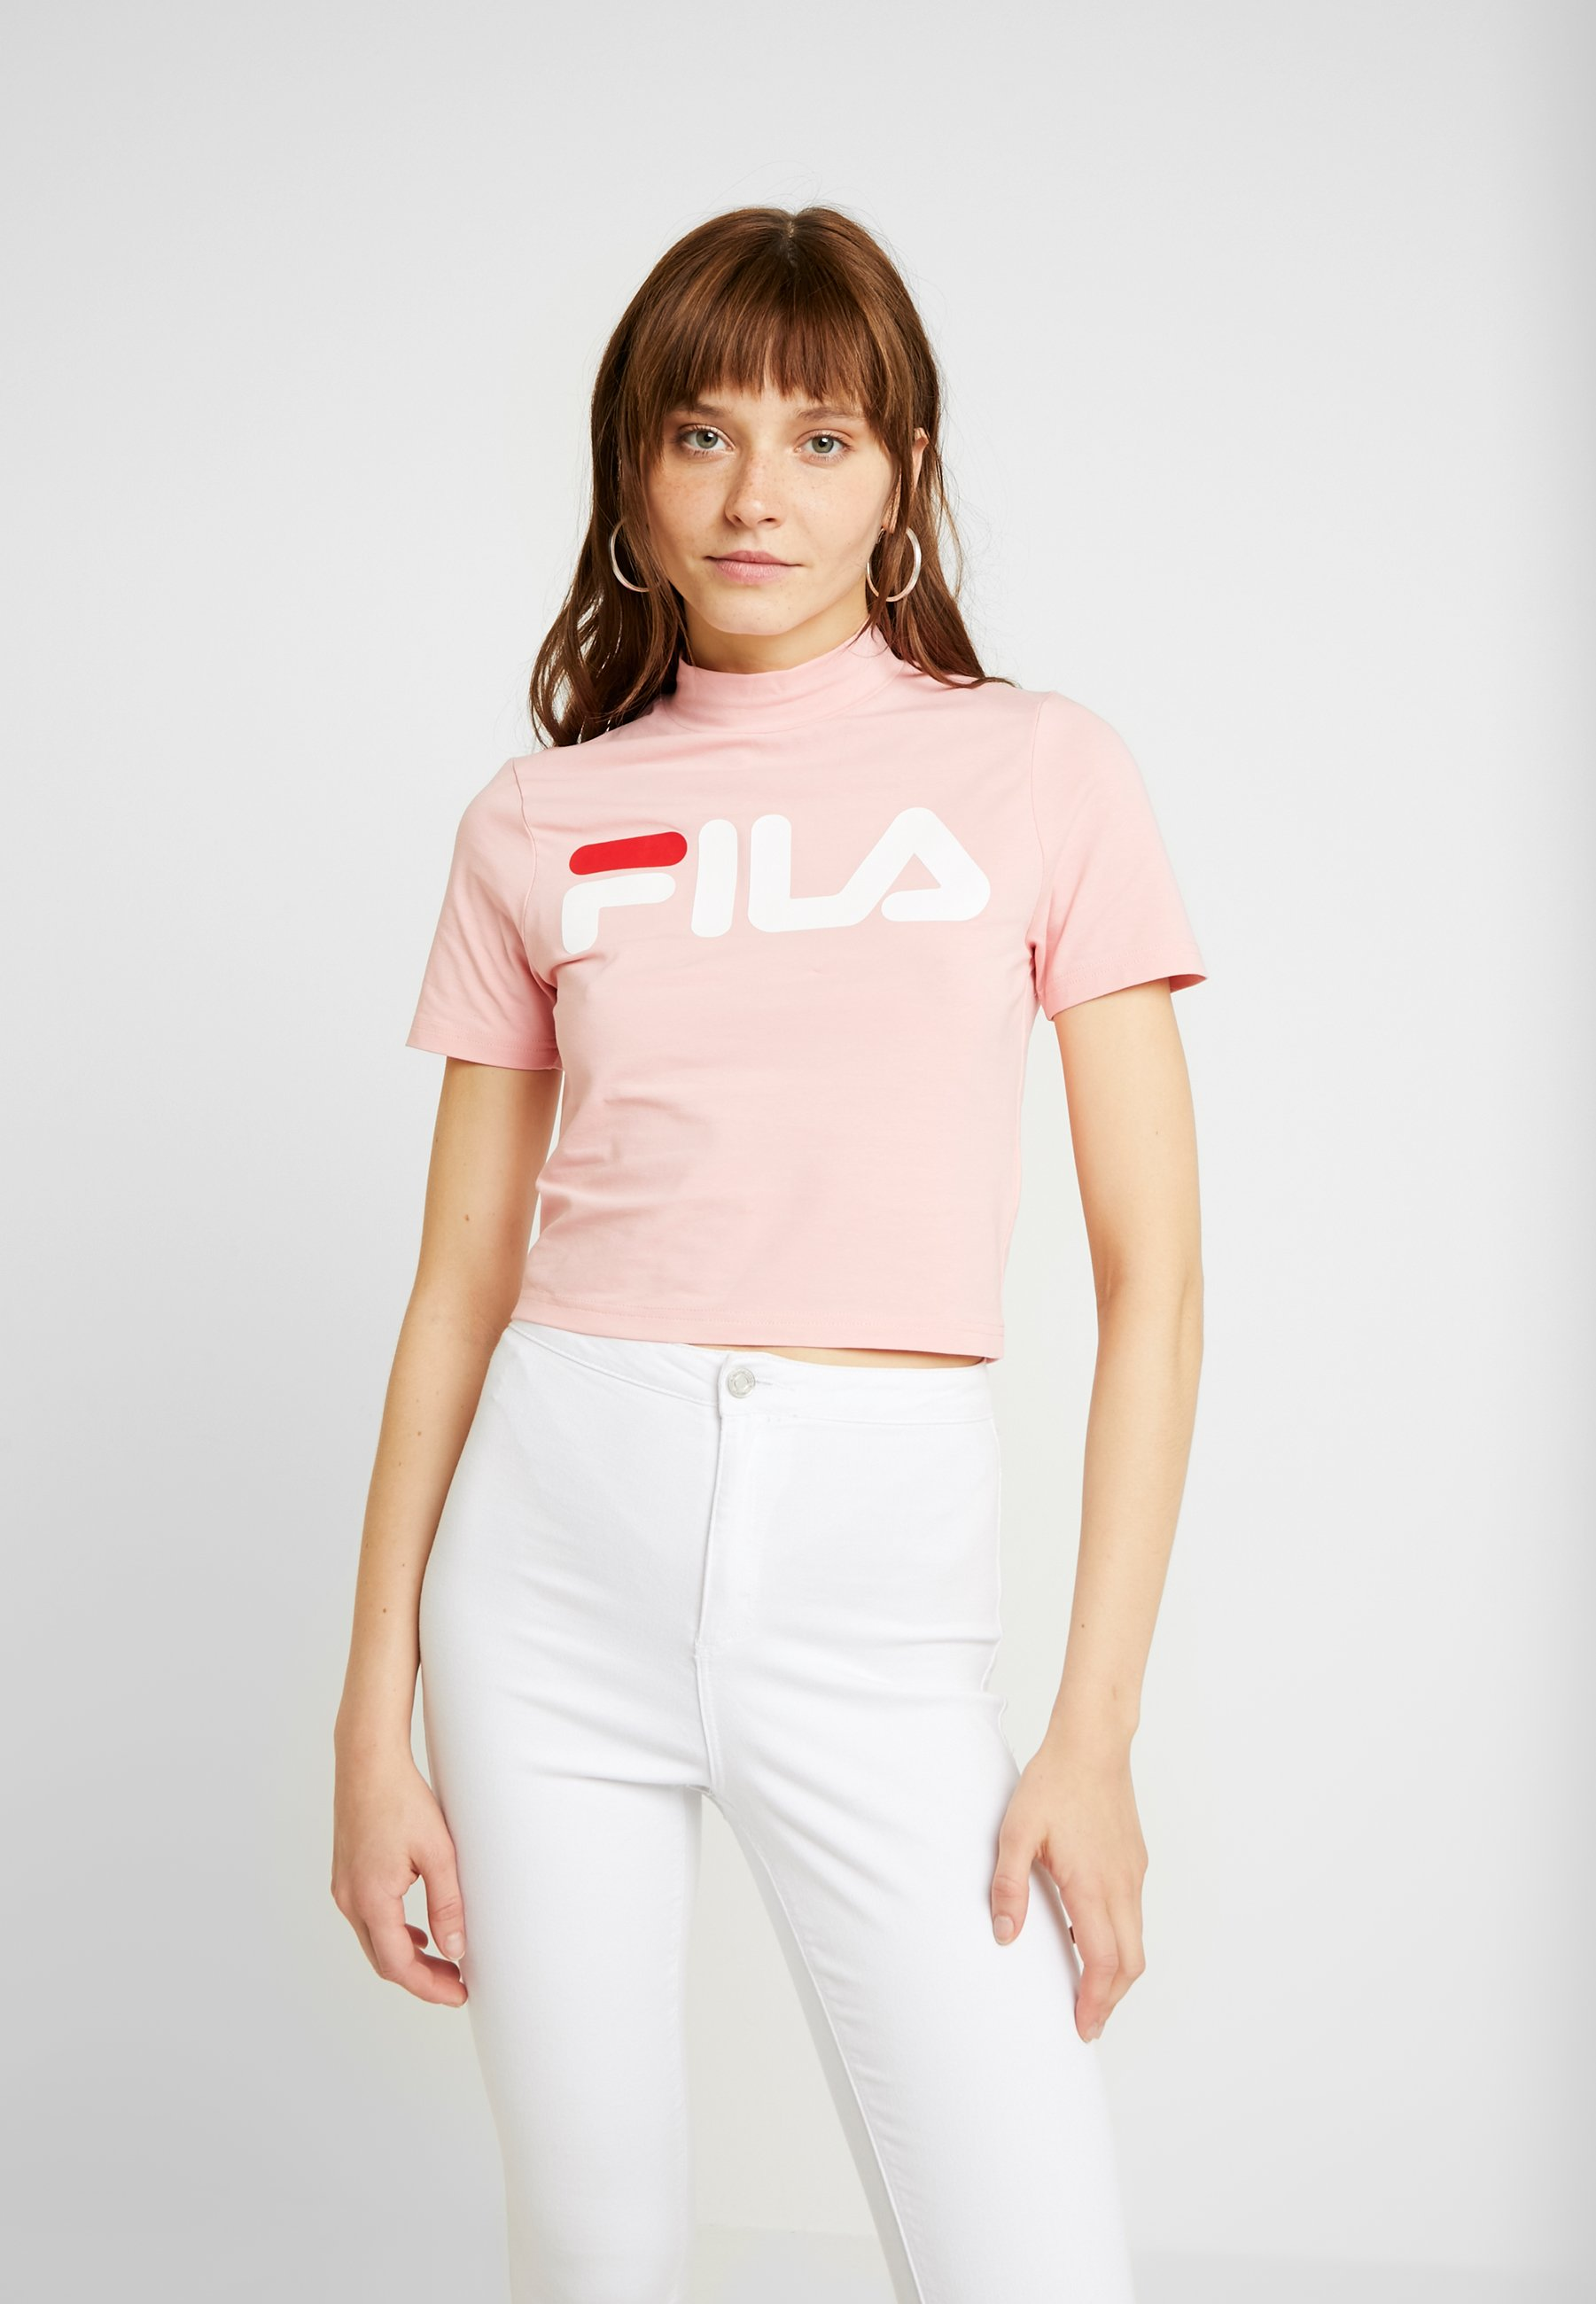 TeeT shirt Quartz Every Fila Pink Turtle Imprimé HED29WI